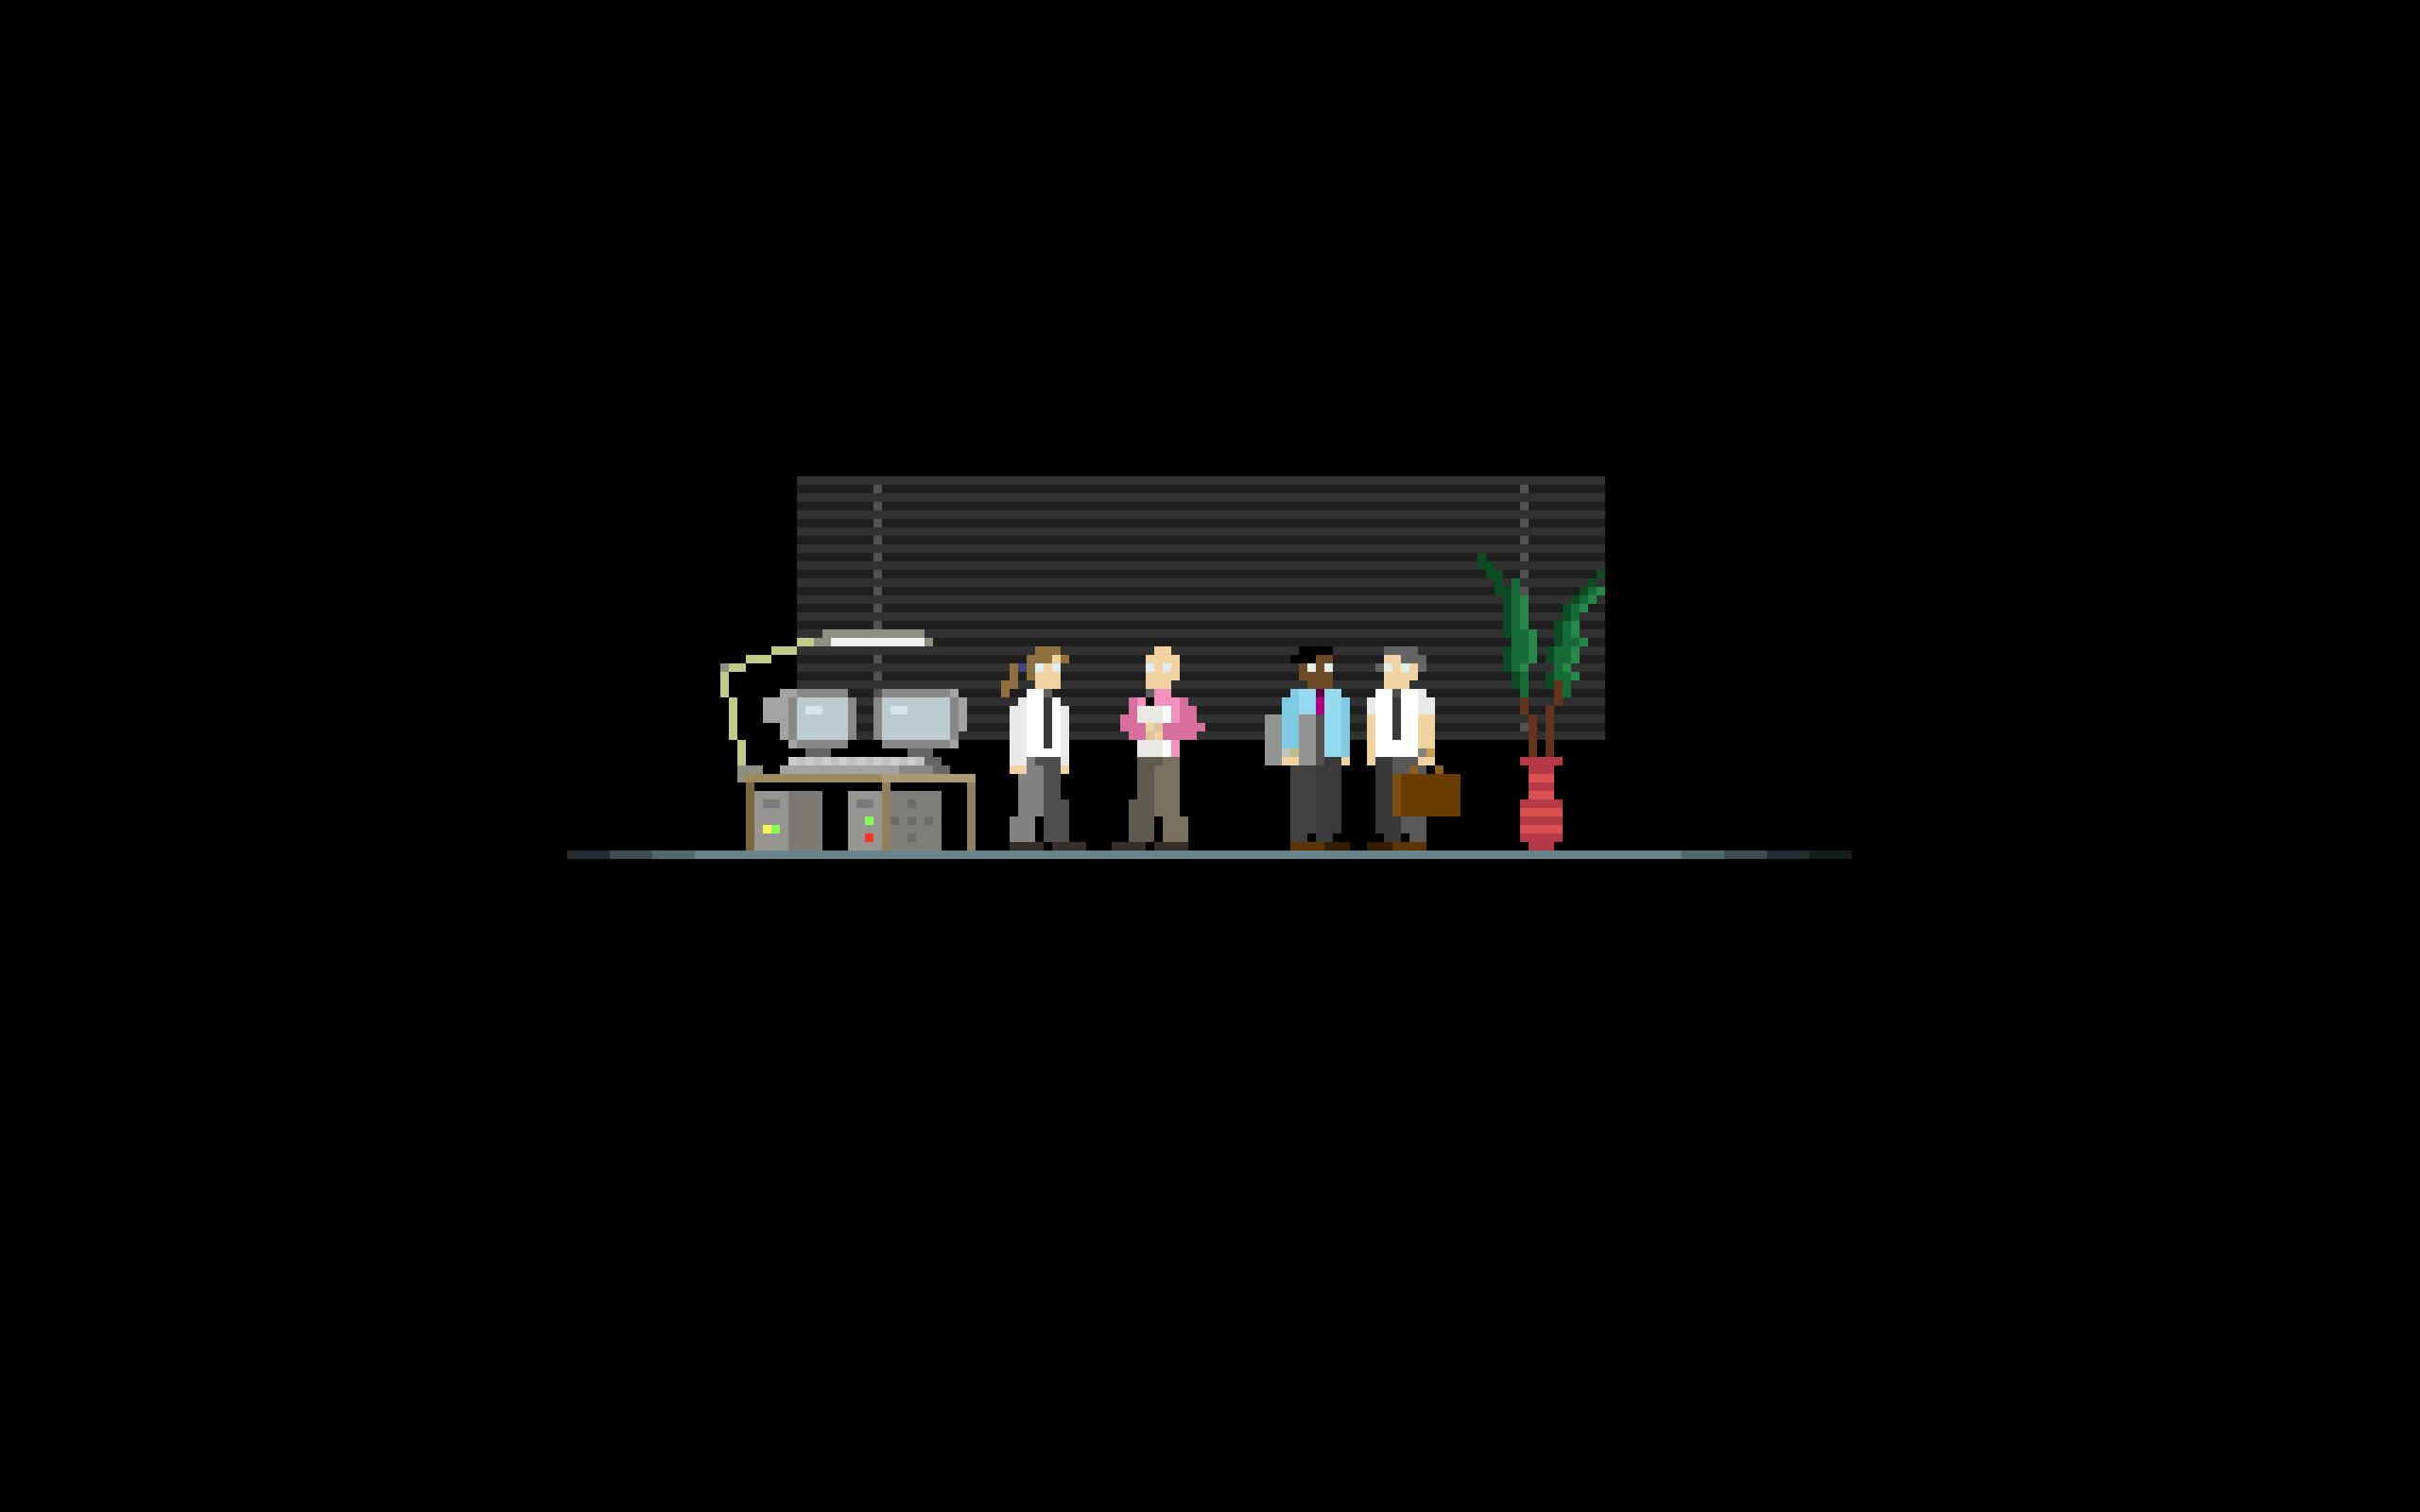 Video Game Computer Wallpapers, Desktop Backgrounds | | ID .